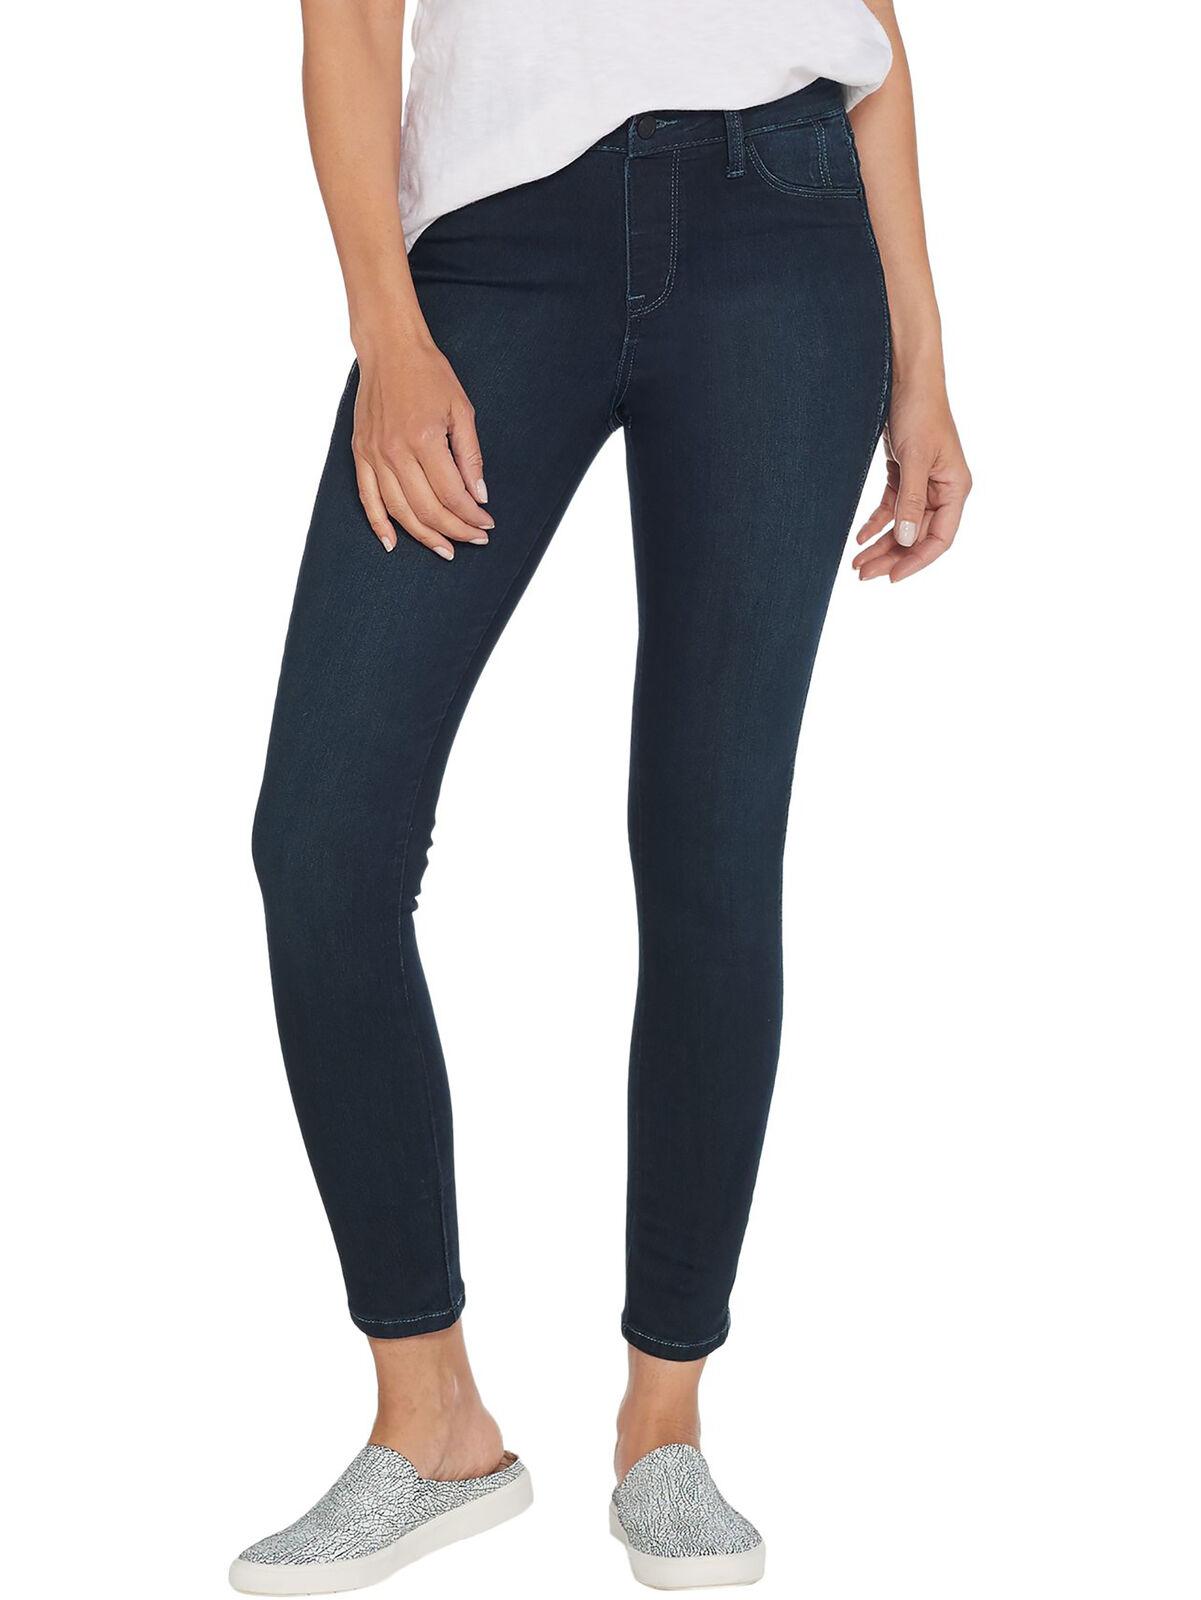 LAURIE FELT Size L Silky Denim Tuxedo-Stitch Skinny Pull-On Jeans INDIGO